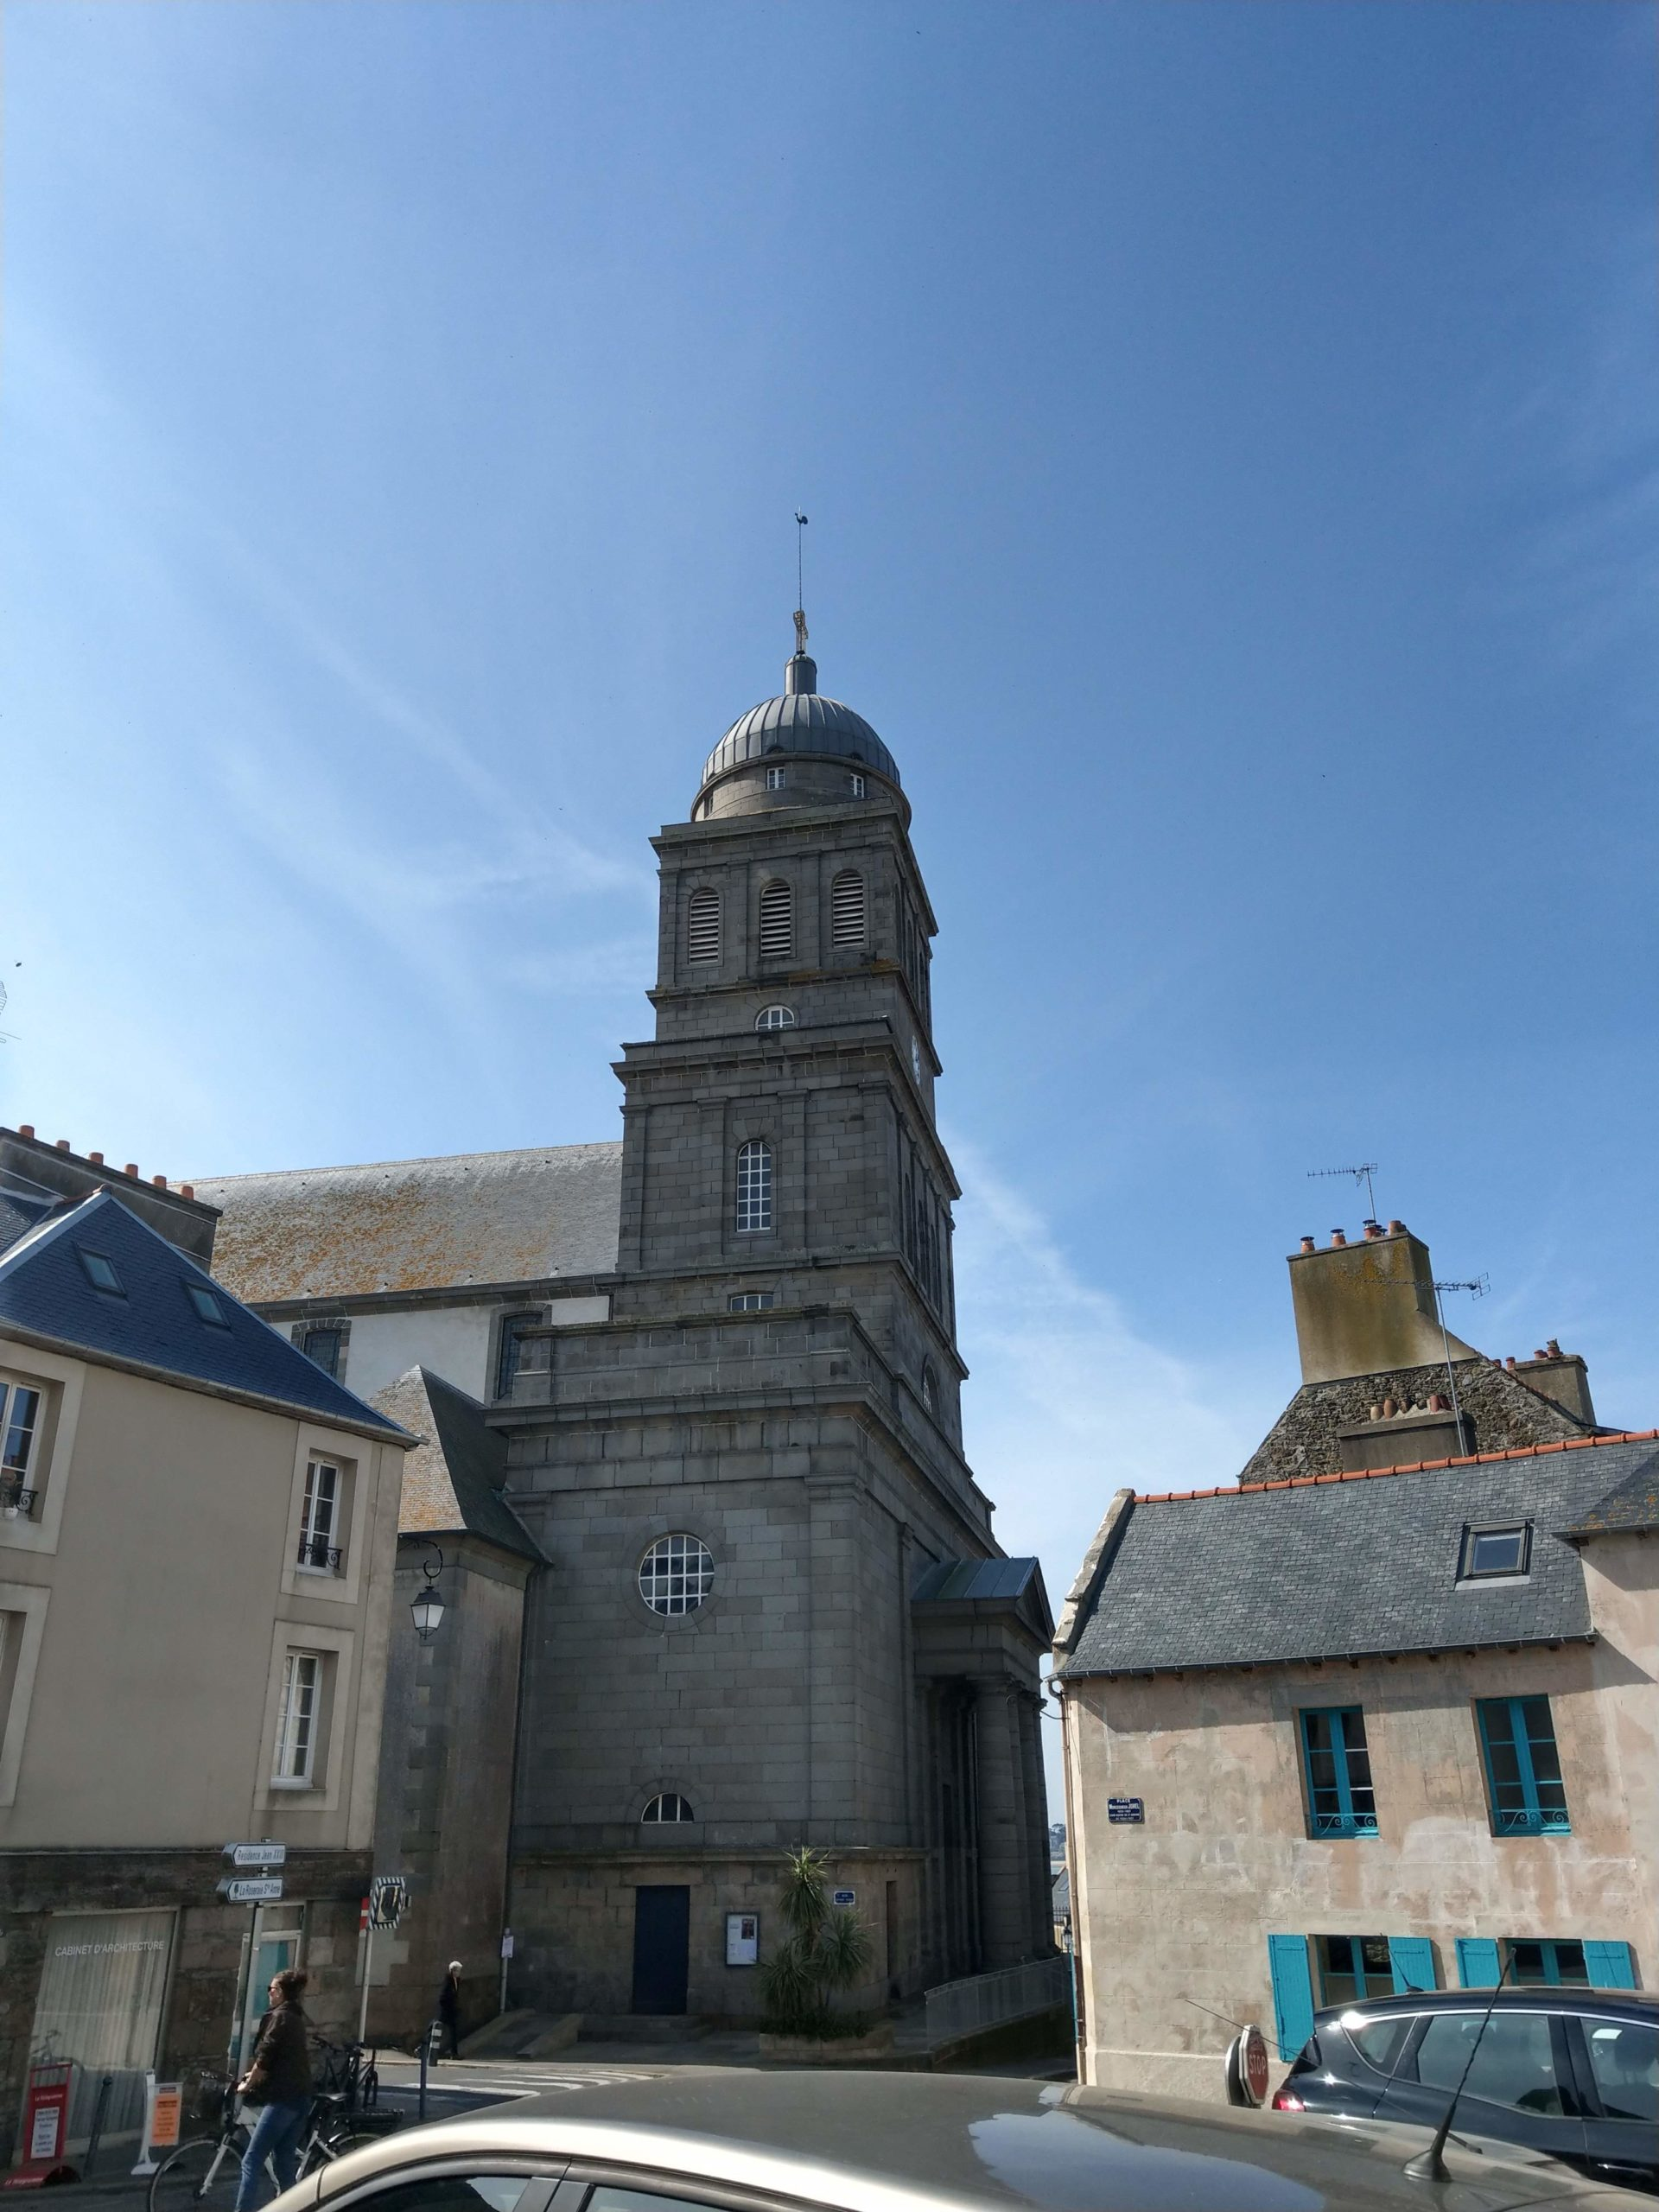 Eglise Sainte-Croix - Saint-Malo